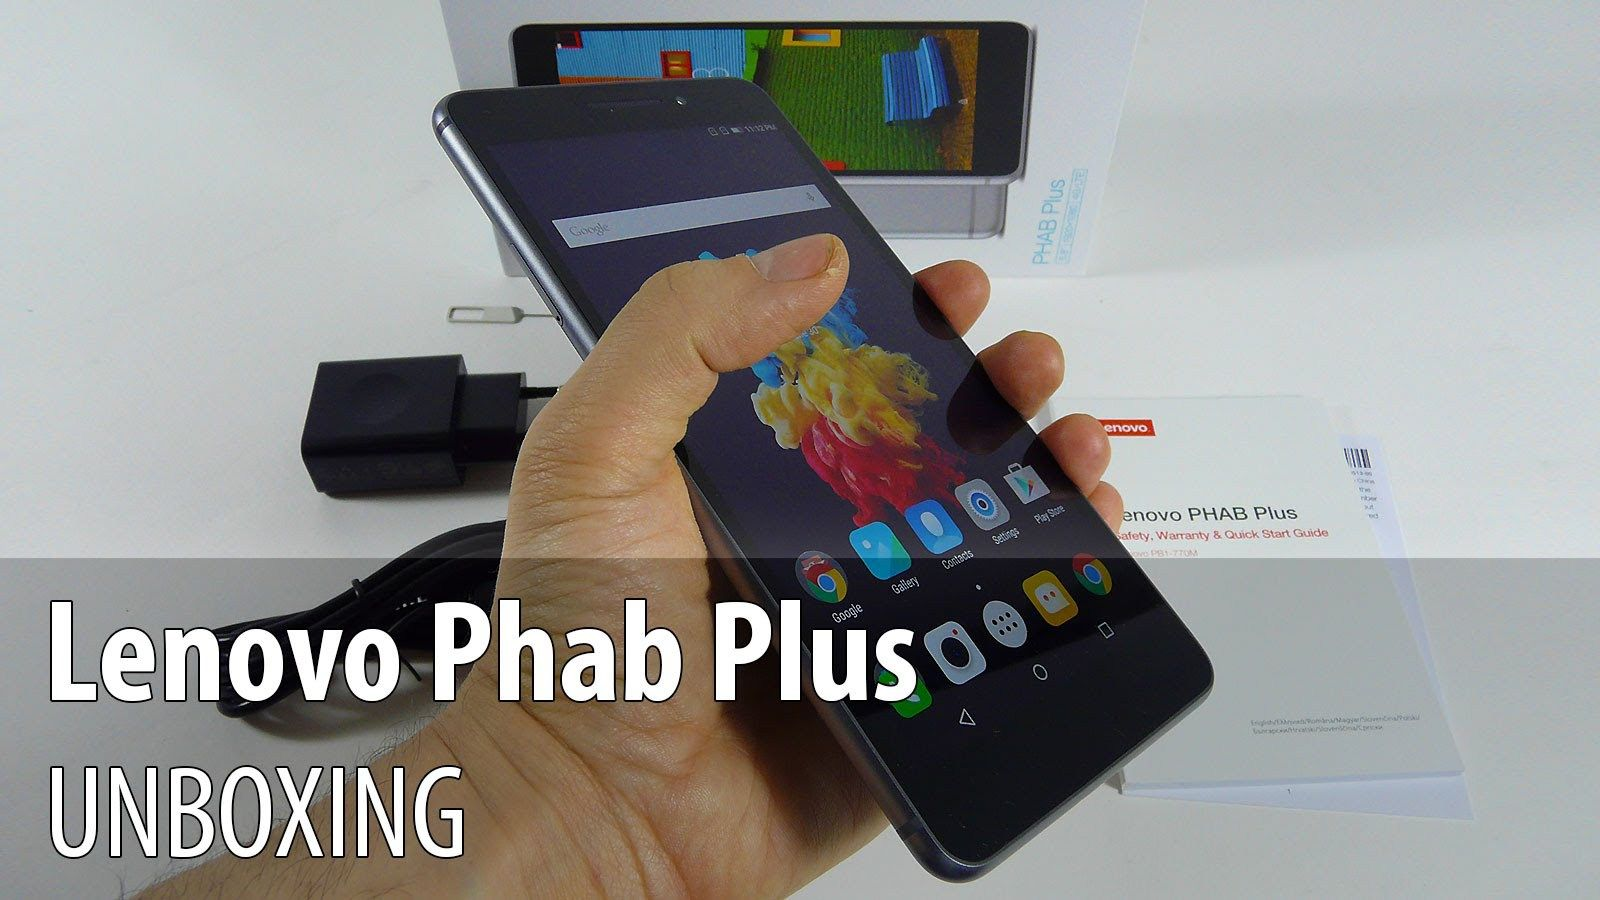 Pin by richardanderson on Price Philippines Samsung